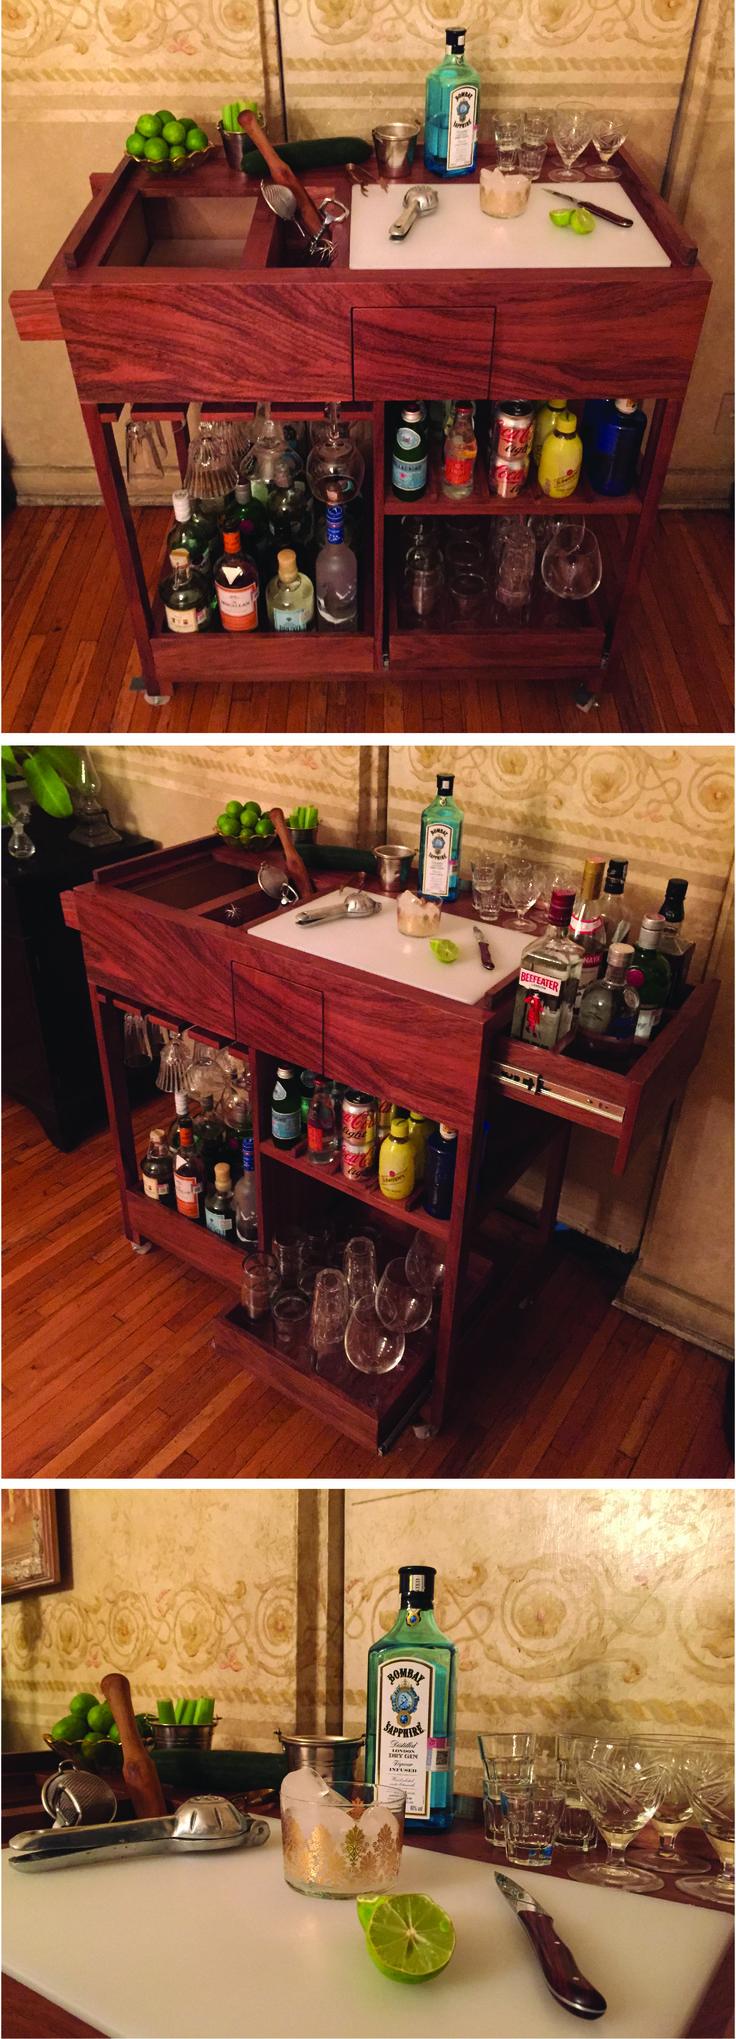 27 Best Videos De Muebles Cocina Images On Pinterest Kitchen Pro Design Roma Sideboard 2 Pintu 3 Laci Espresso Service Bar Cart Original By Plan J Handmade In Mexico